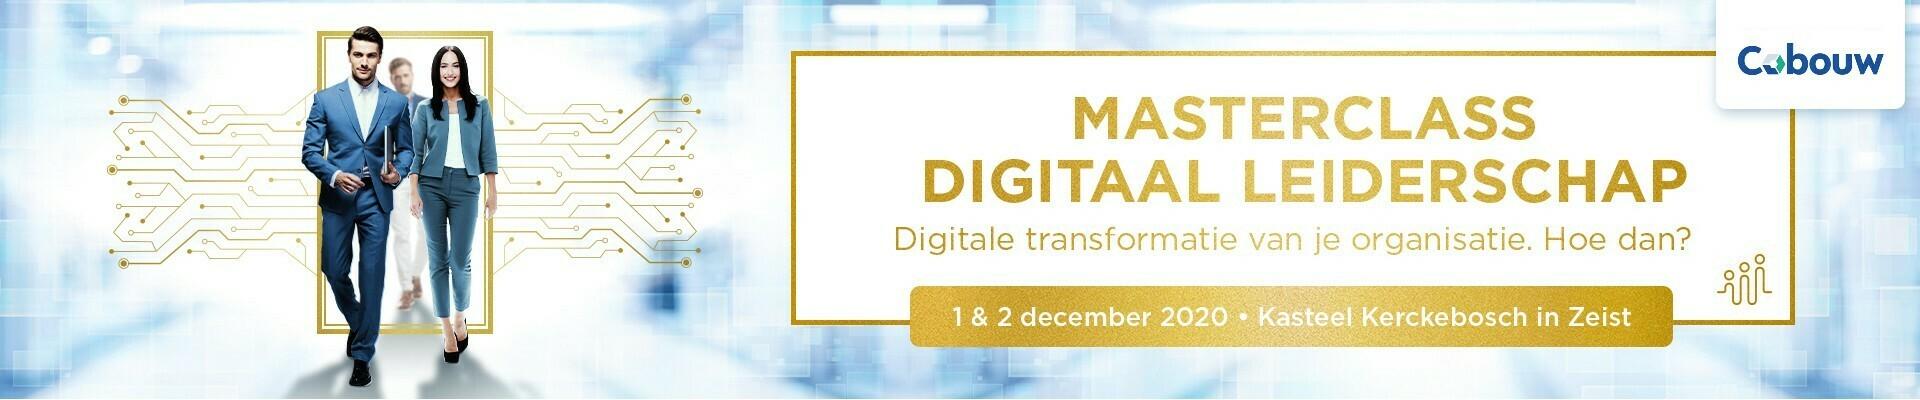 Masterclass Digitaal Leiderschap Infra, 23 en 24 november 2020